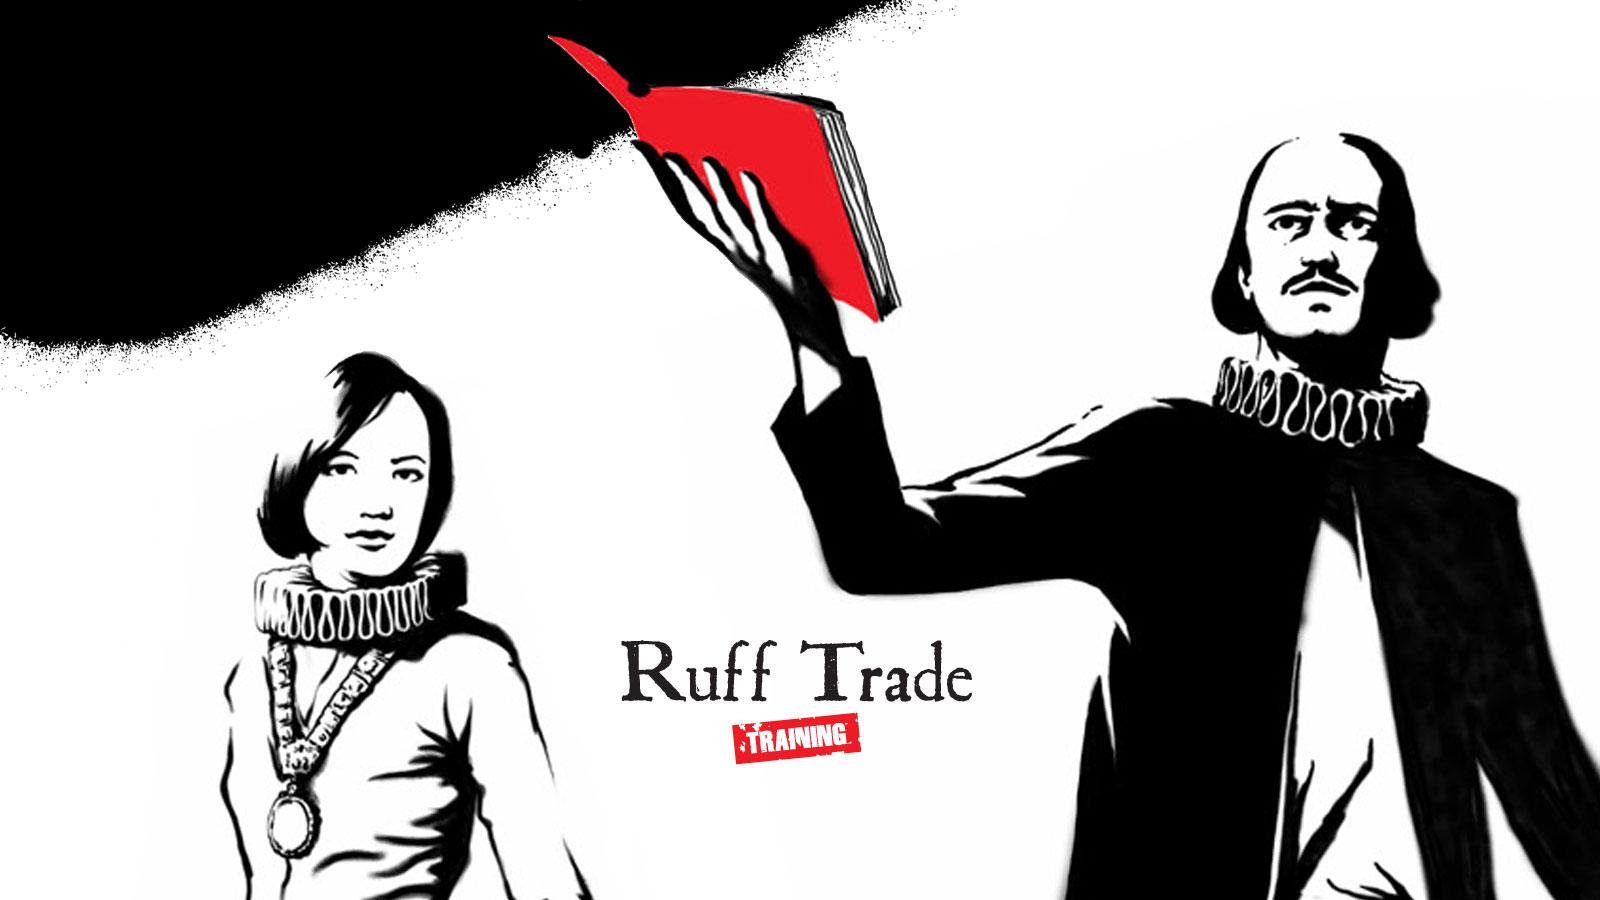 Ruff Trade Training Company Website